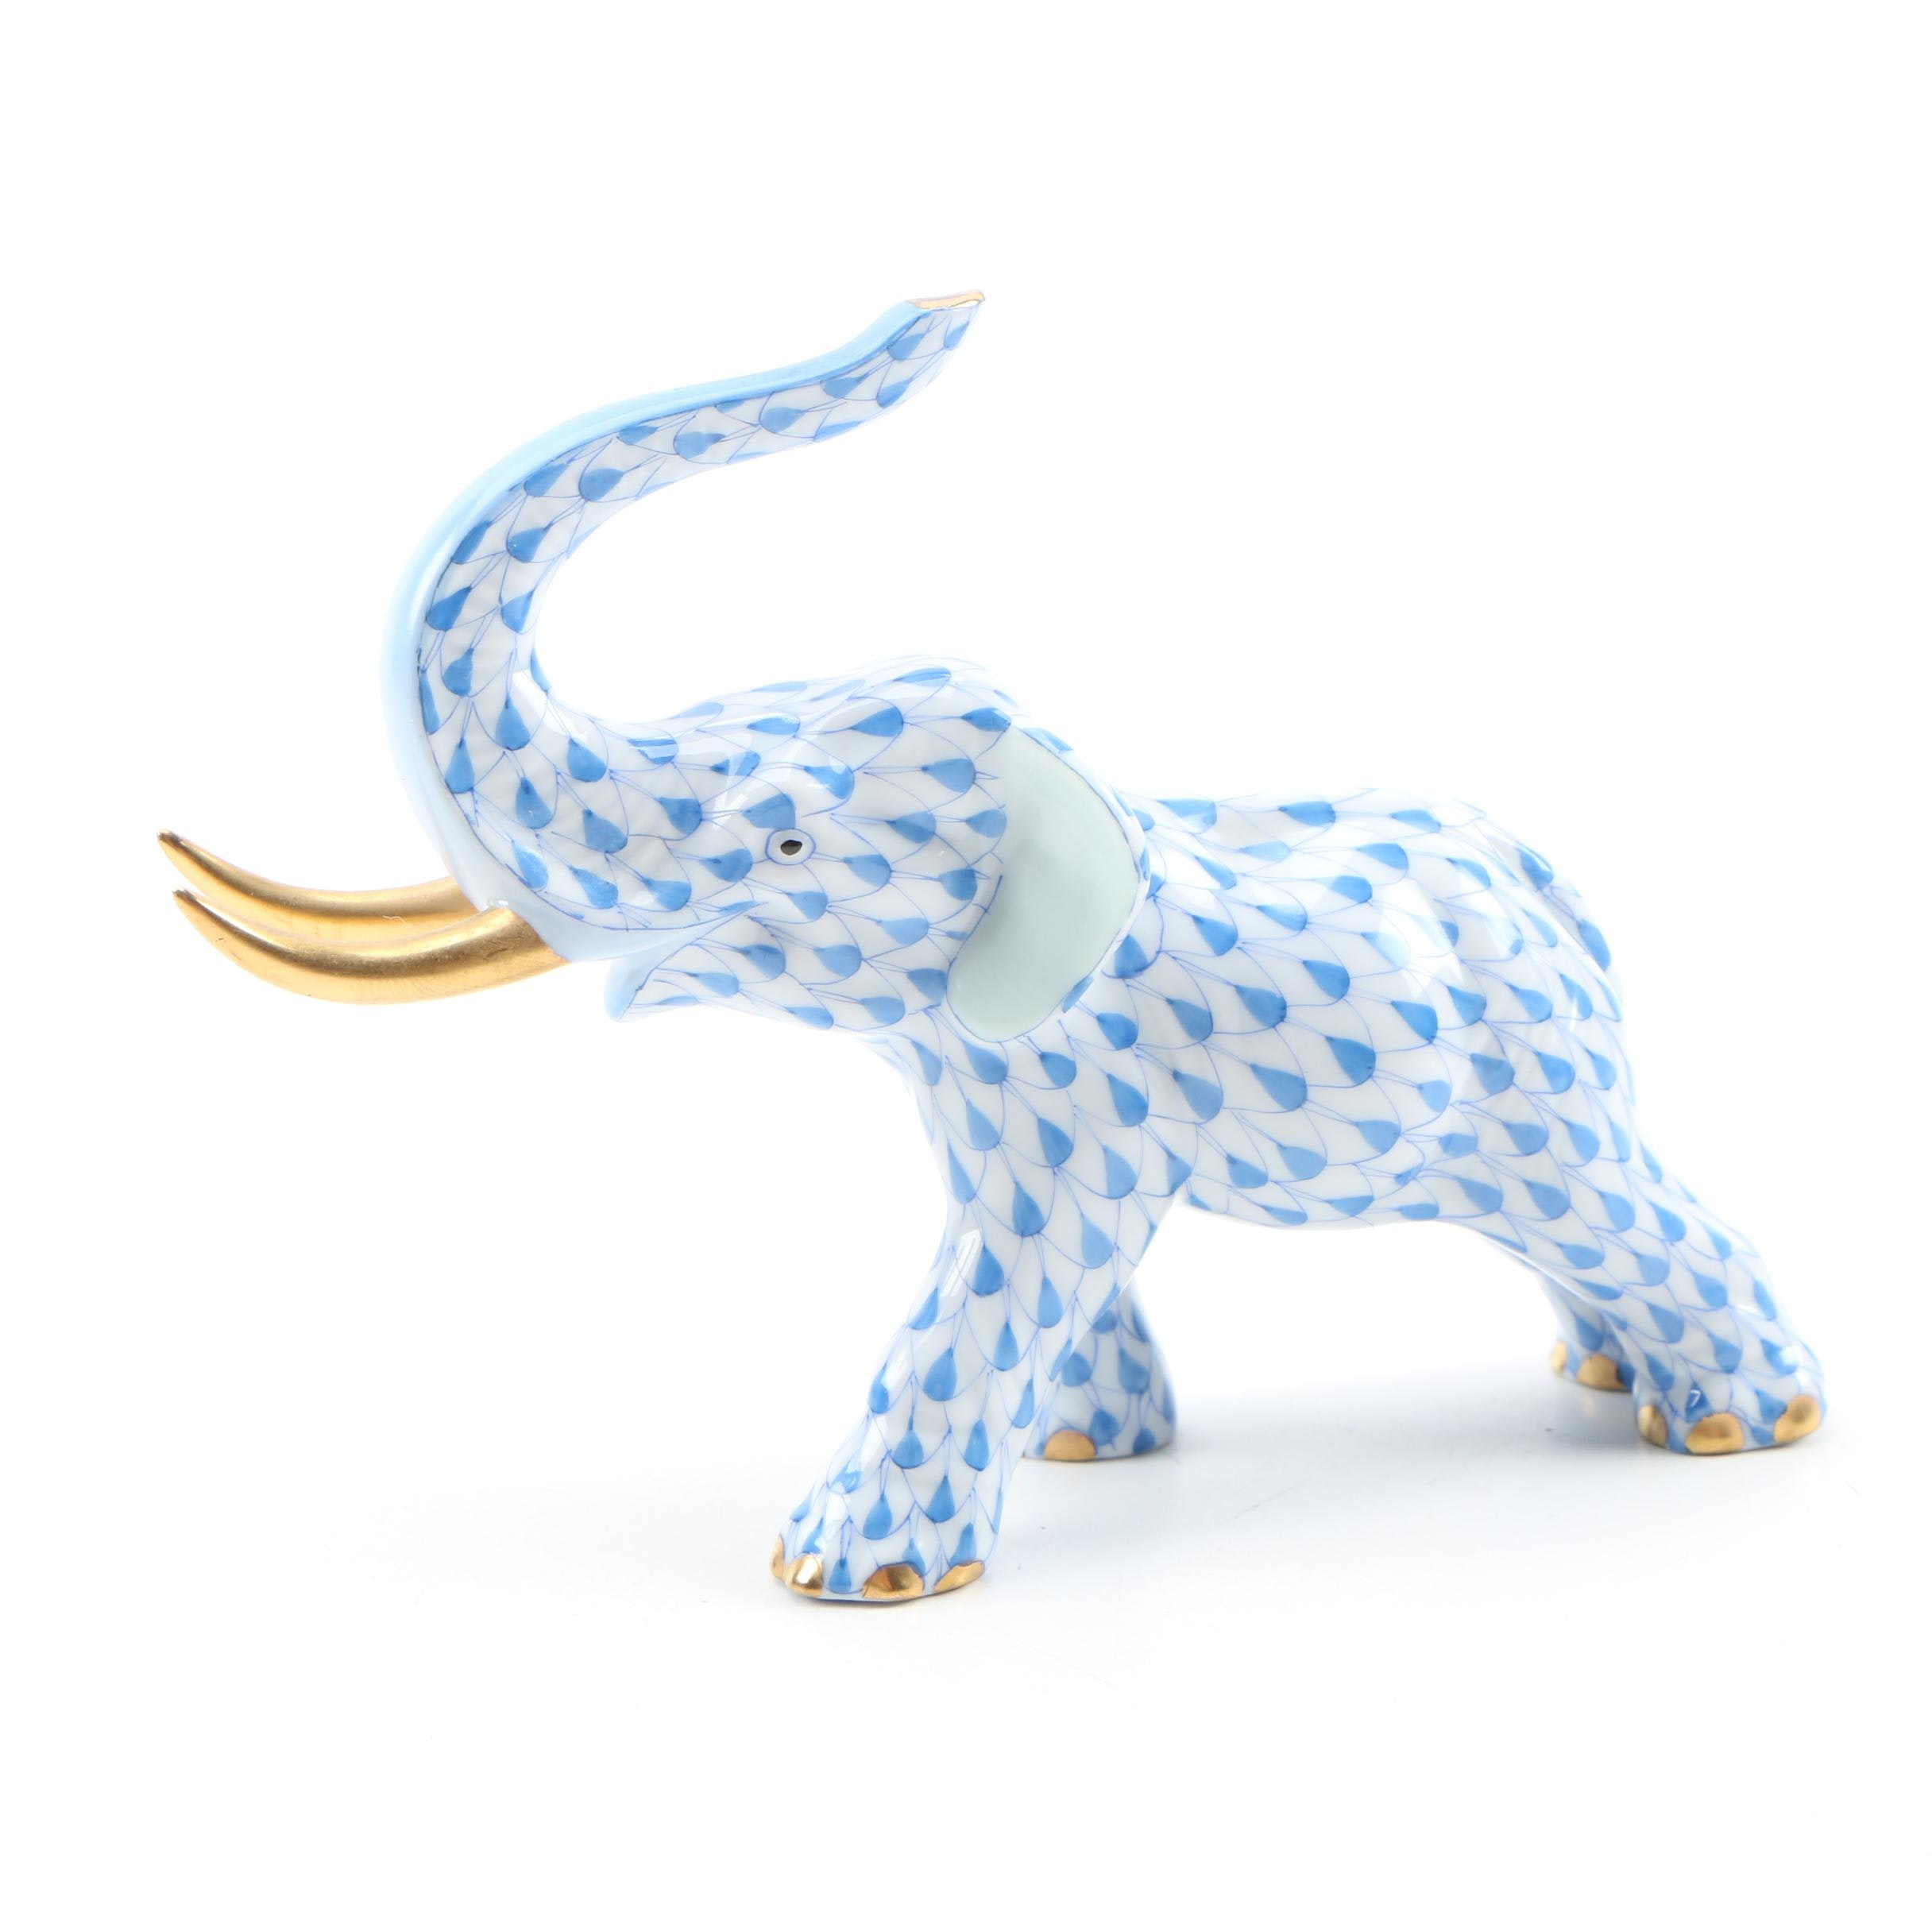 "Herend Blue Fishnet ""Elephant with Tusks"" Porcelain Figurine, 2000"